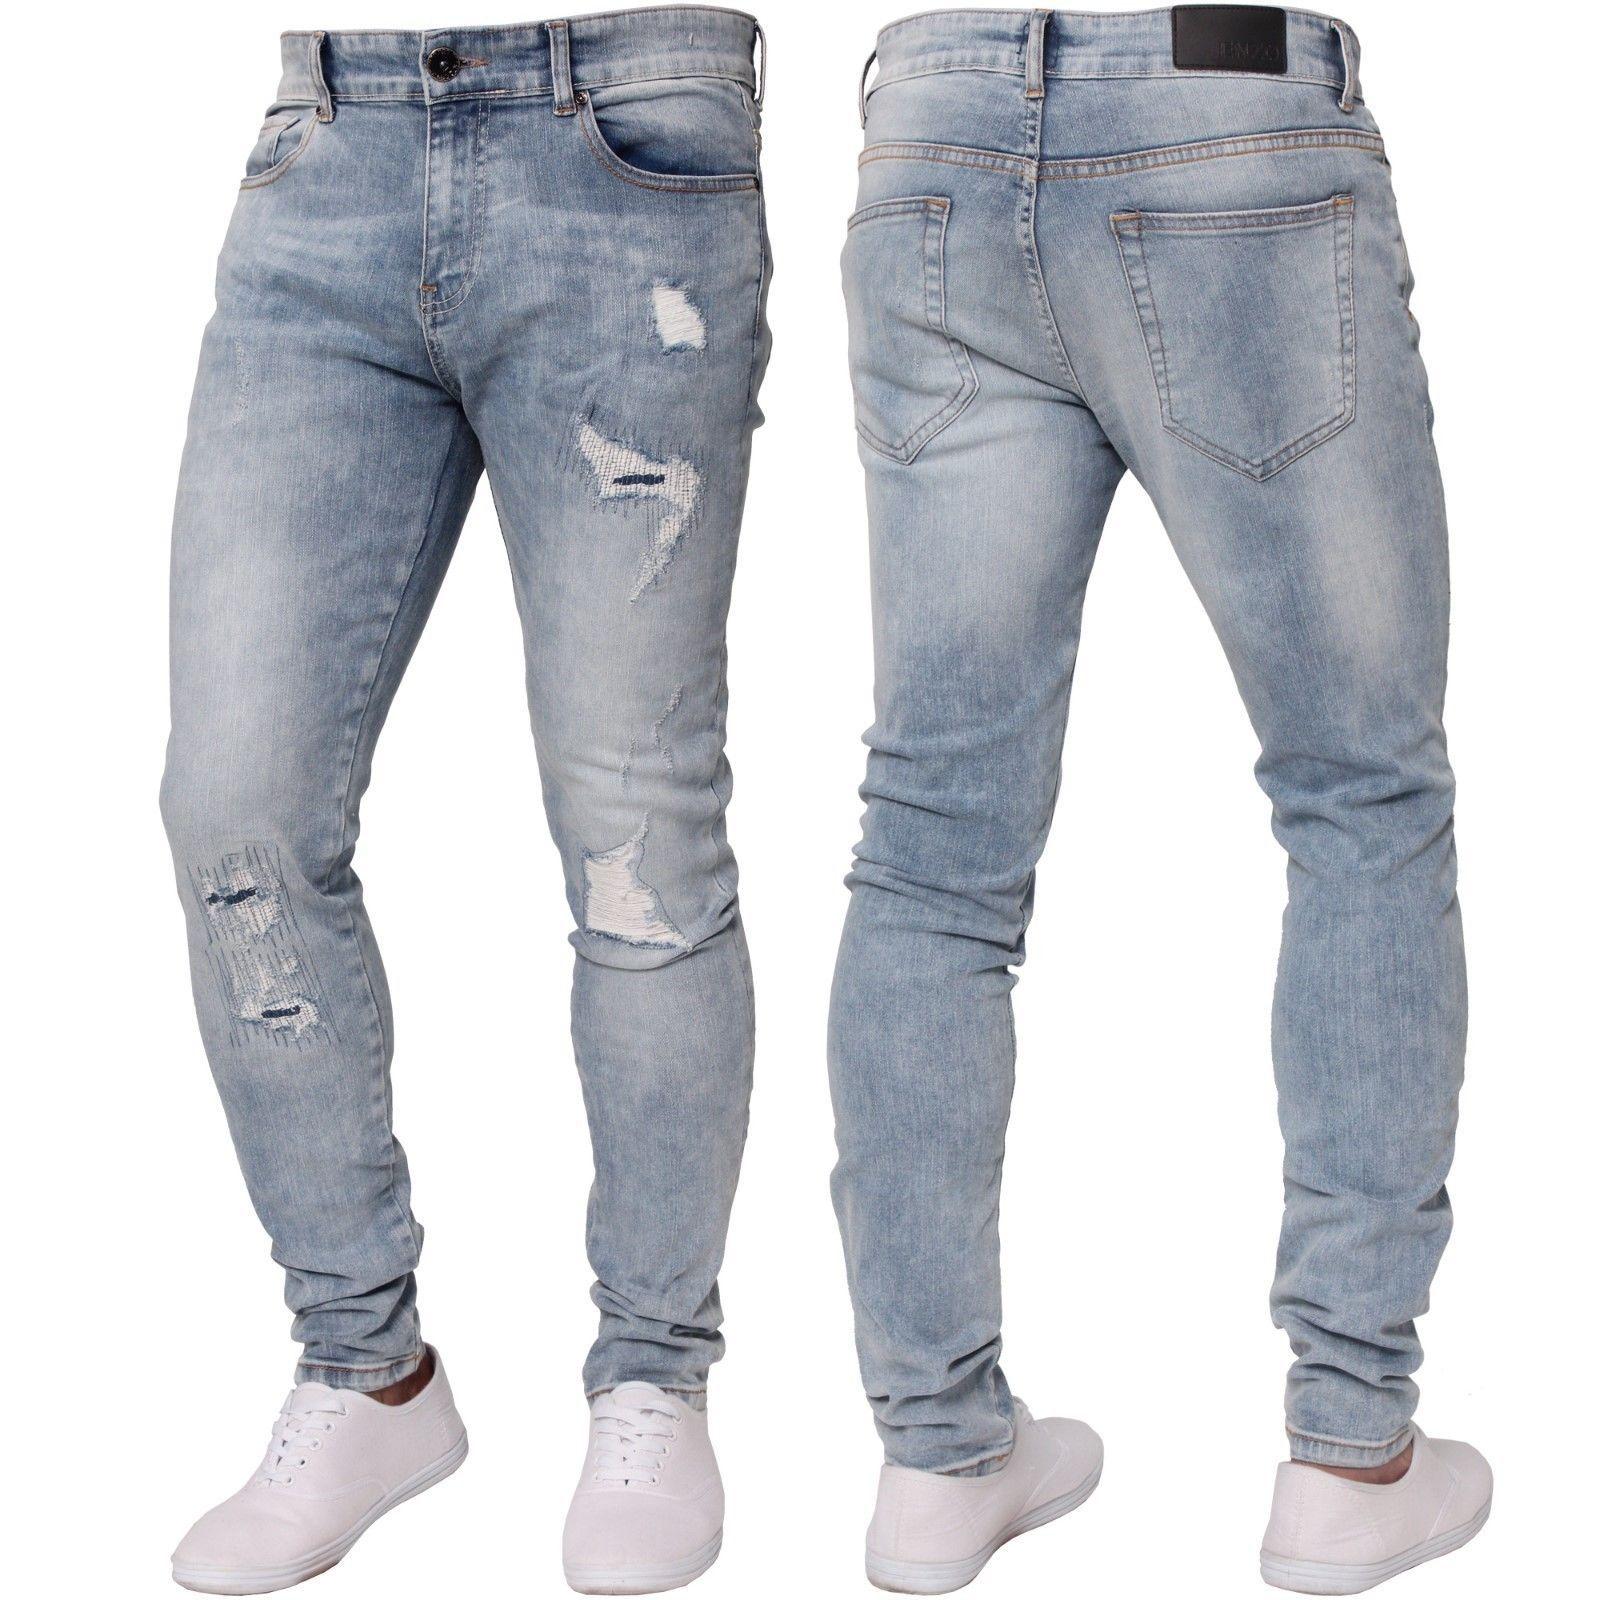 5038f523ac08 New ENZO Mens Skinny Super Stretch Fit Ripped Denim Jeans All Waist Blue  Black   eBay  Denim Jean Pants Men  Denim Pants  Denim Jeans for Men   Denims for ...